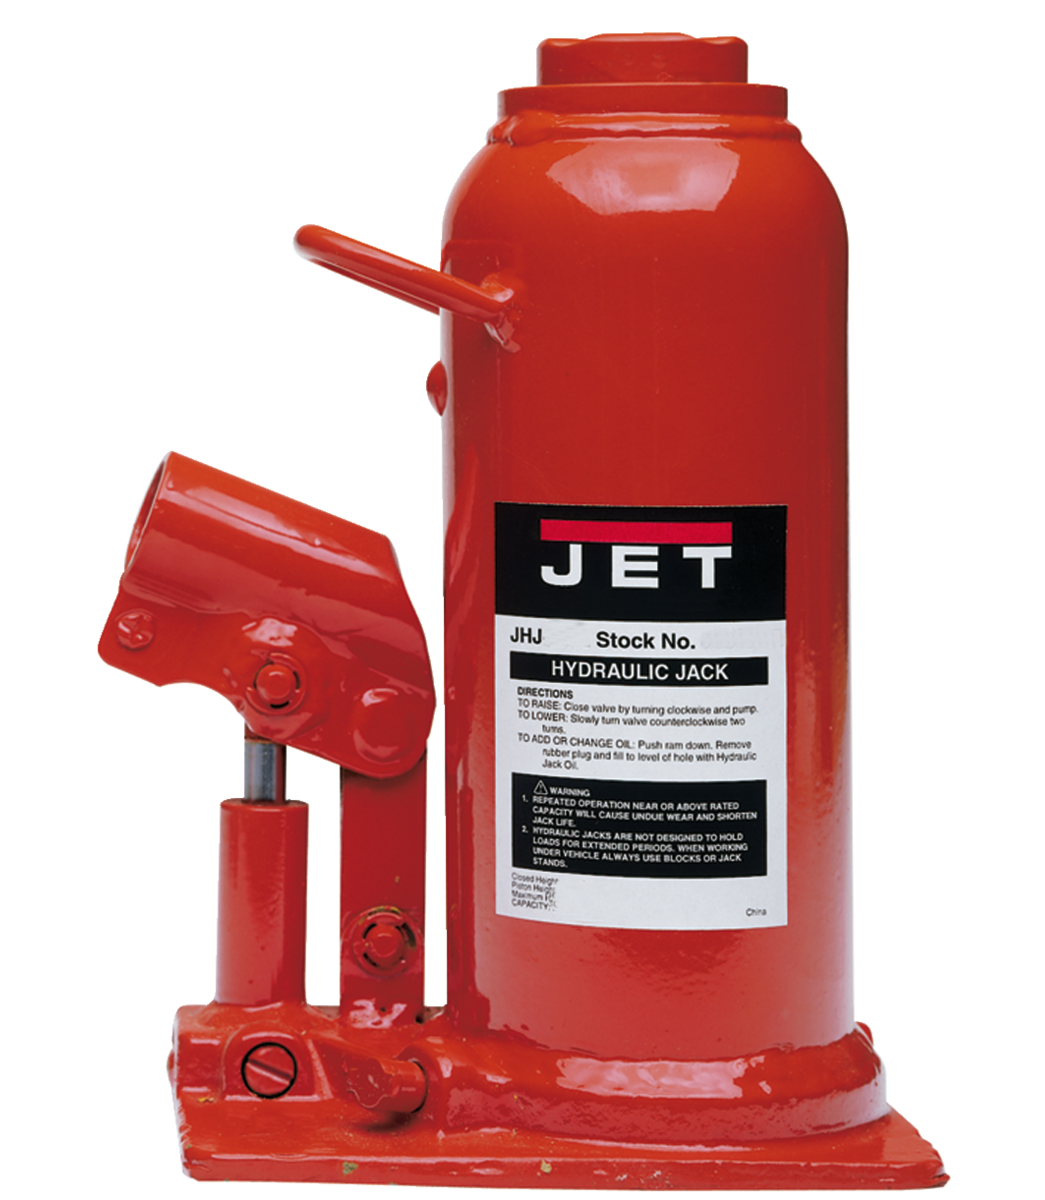 JHJ-12-1/2, 12-1/2-Ton Hydraulic Bottle Jack